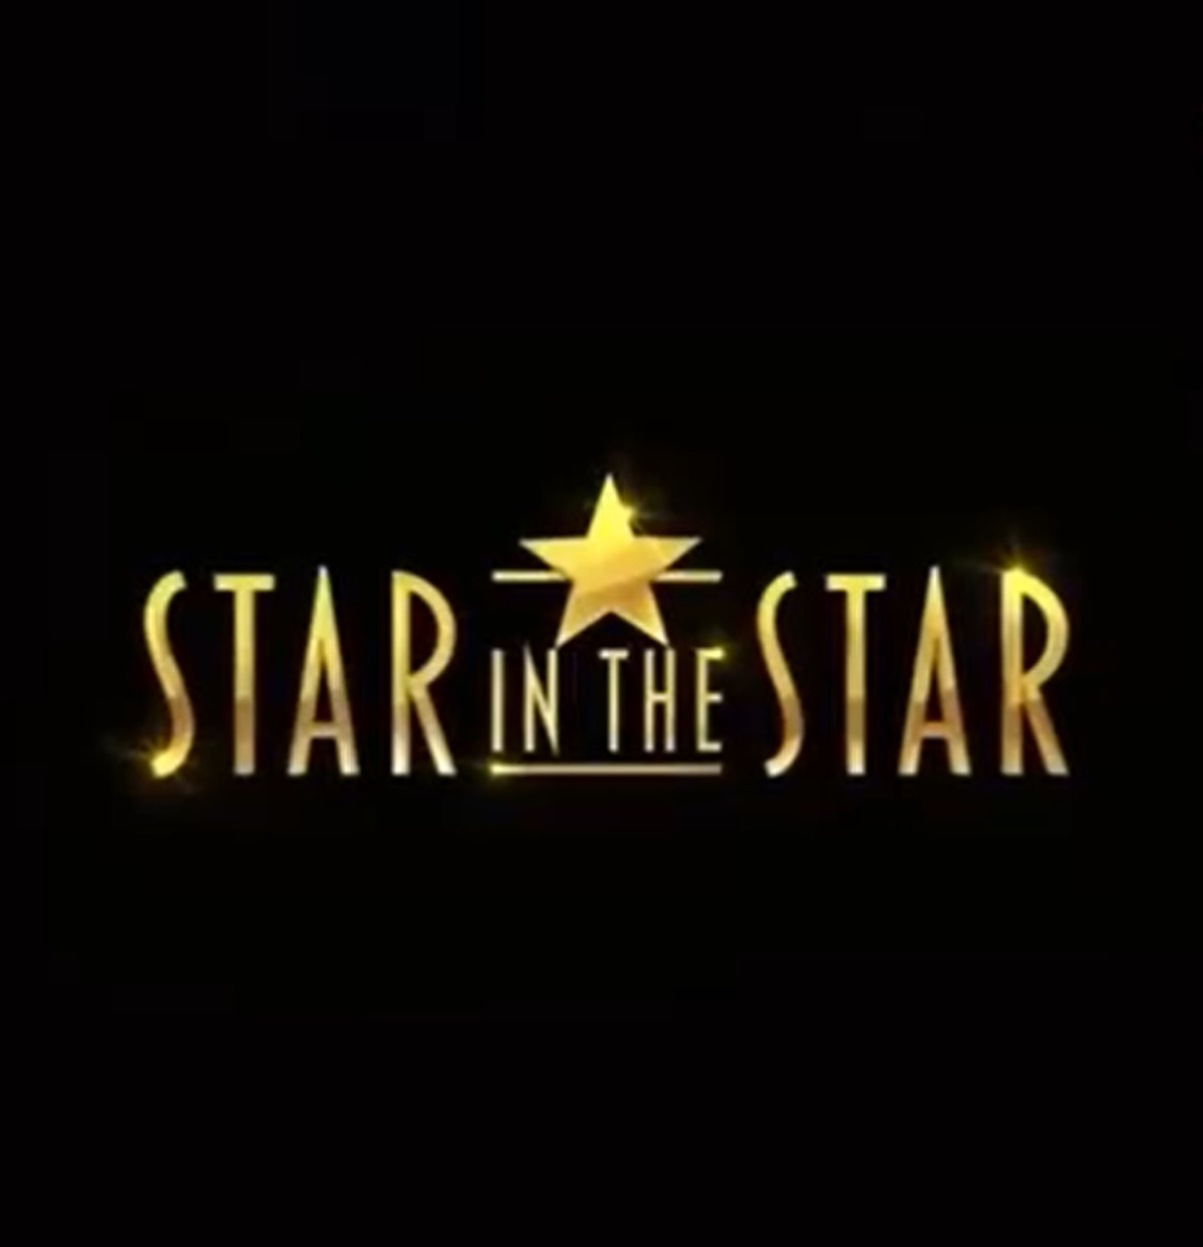 ilary blasi star in the star polemiche